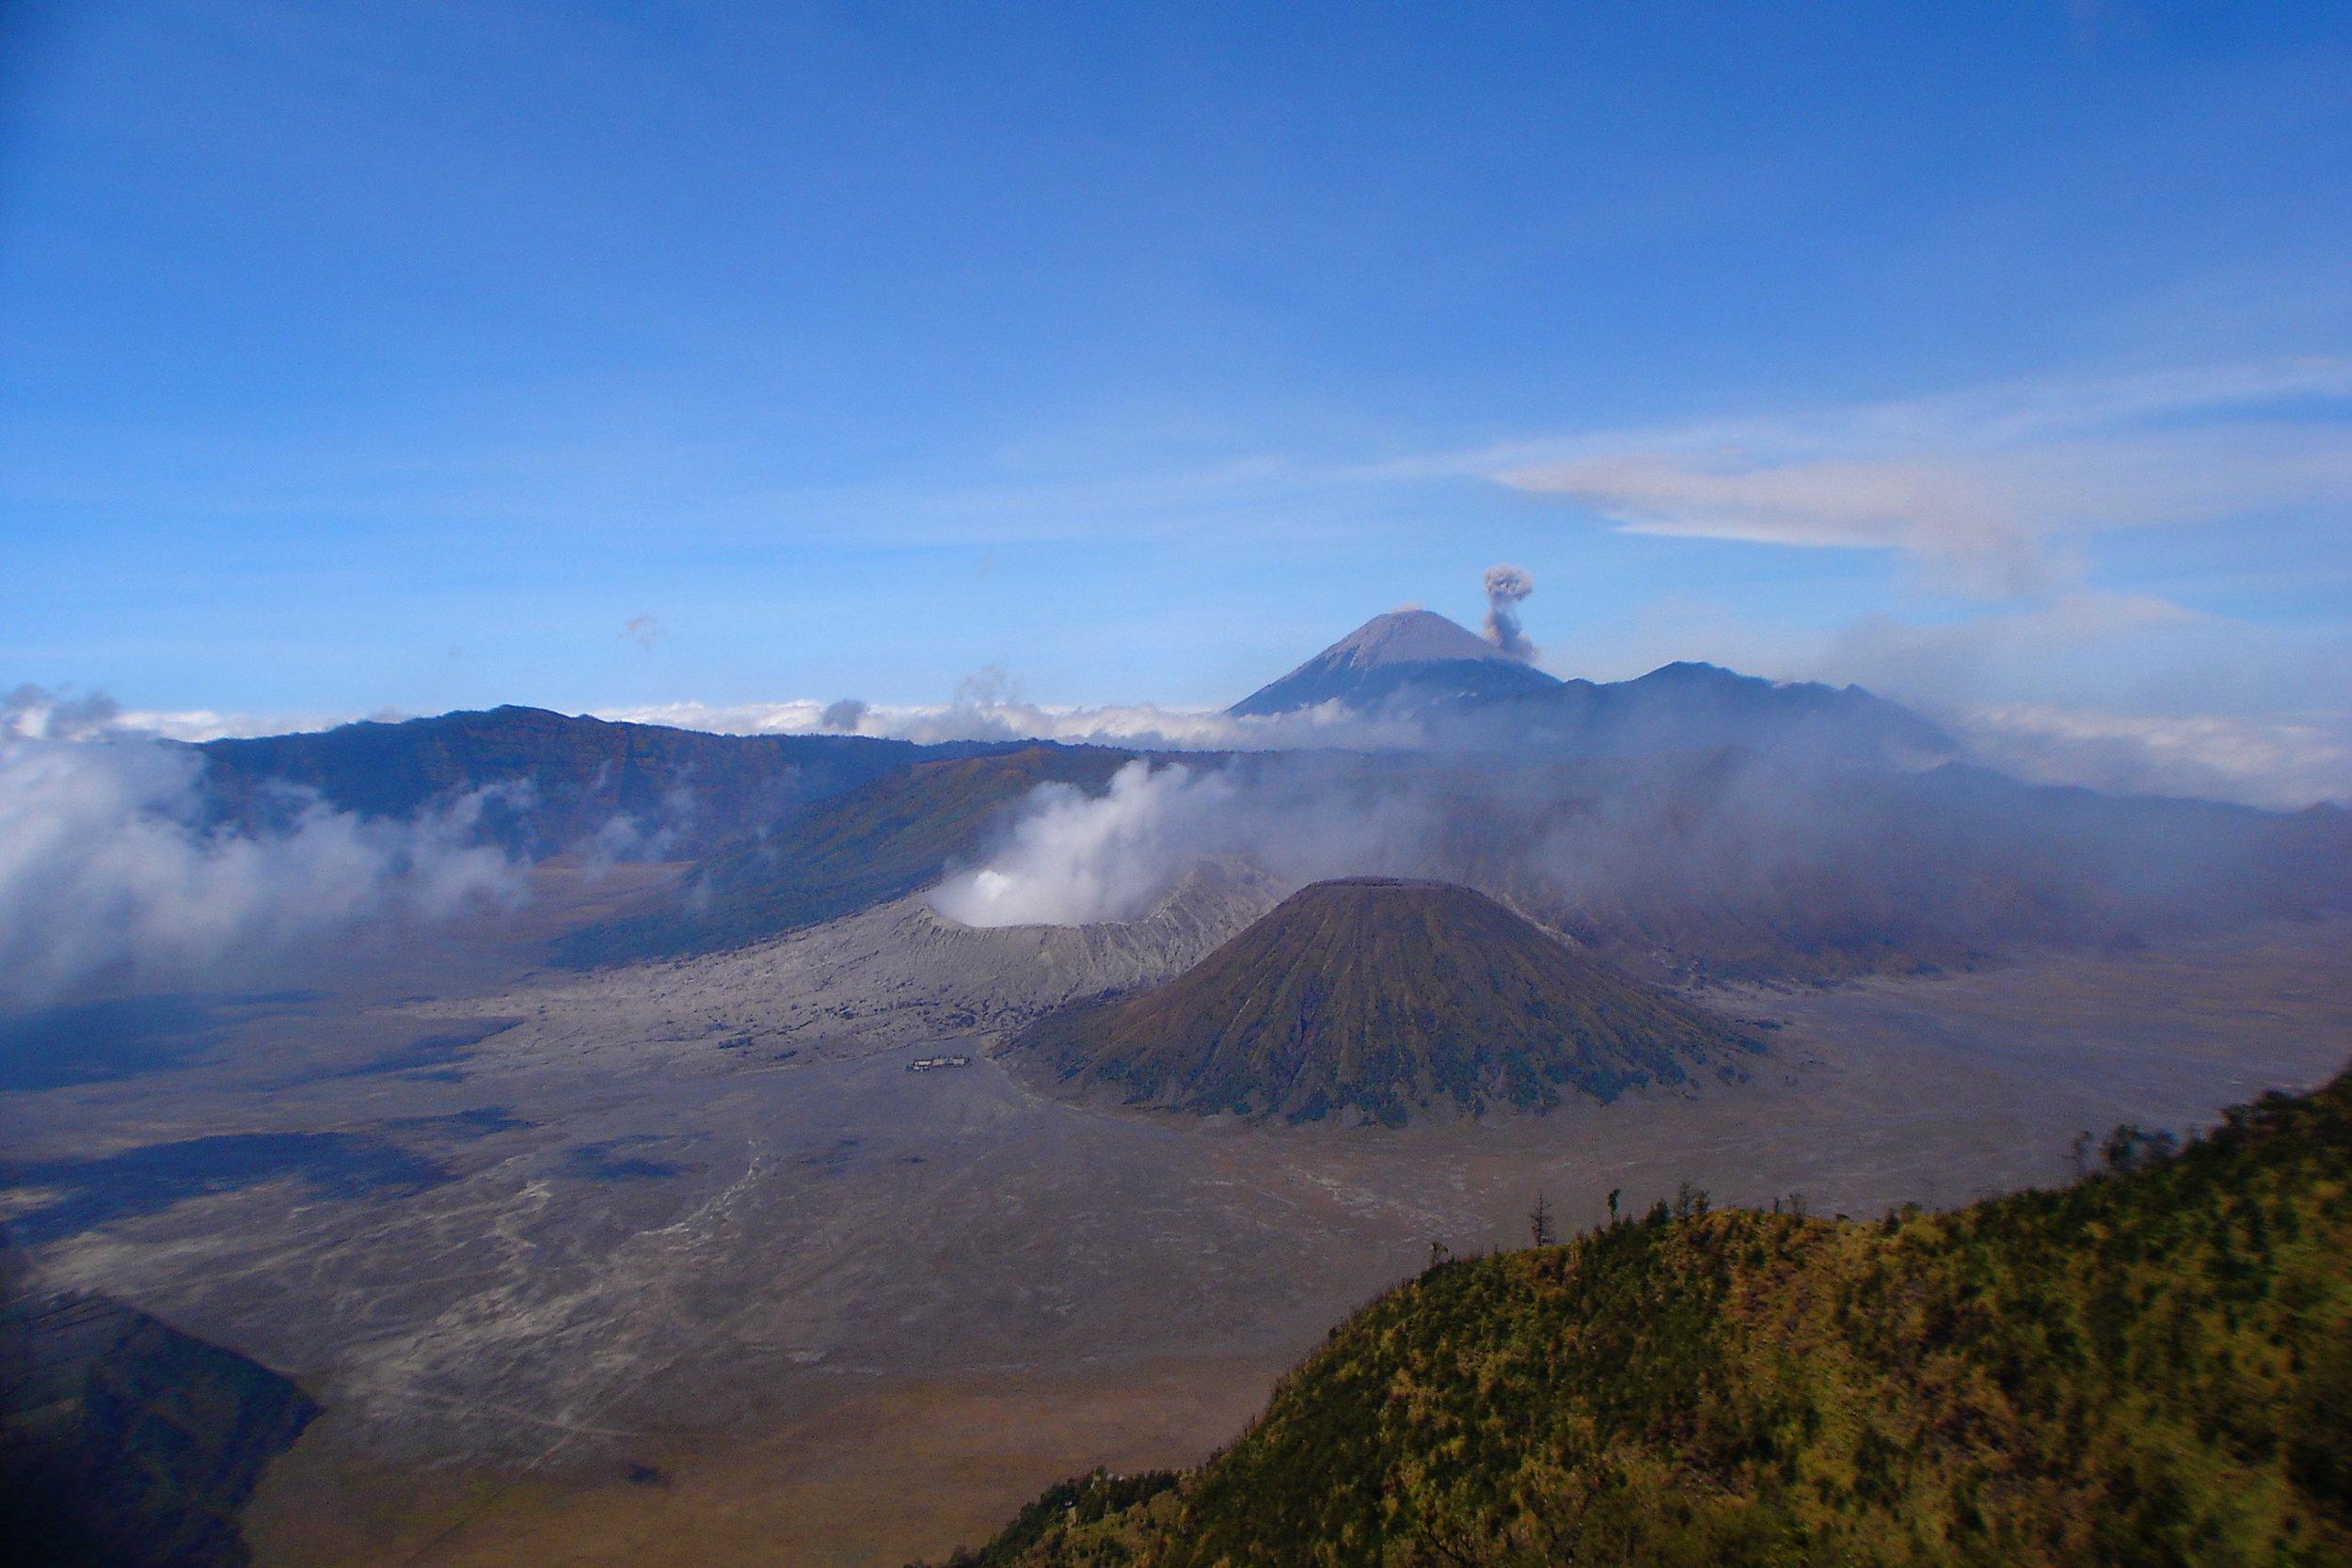 Indonesia 2008 - Volcanological Fieldtrip